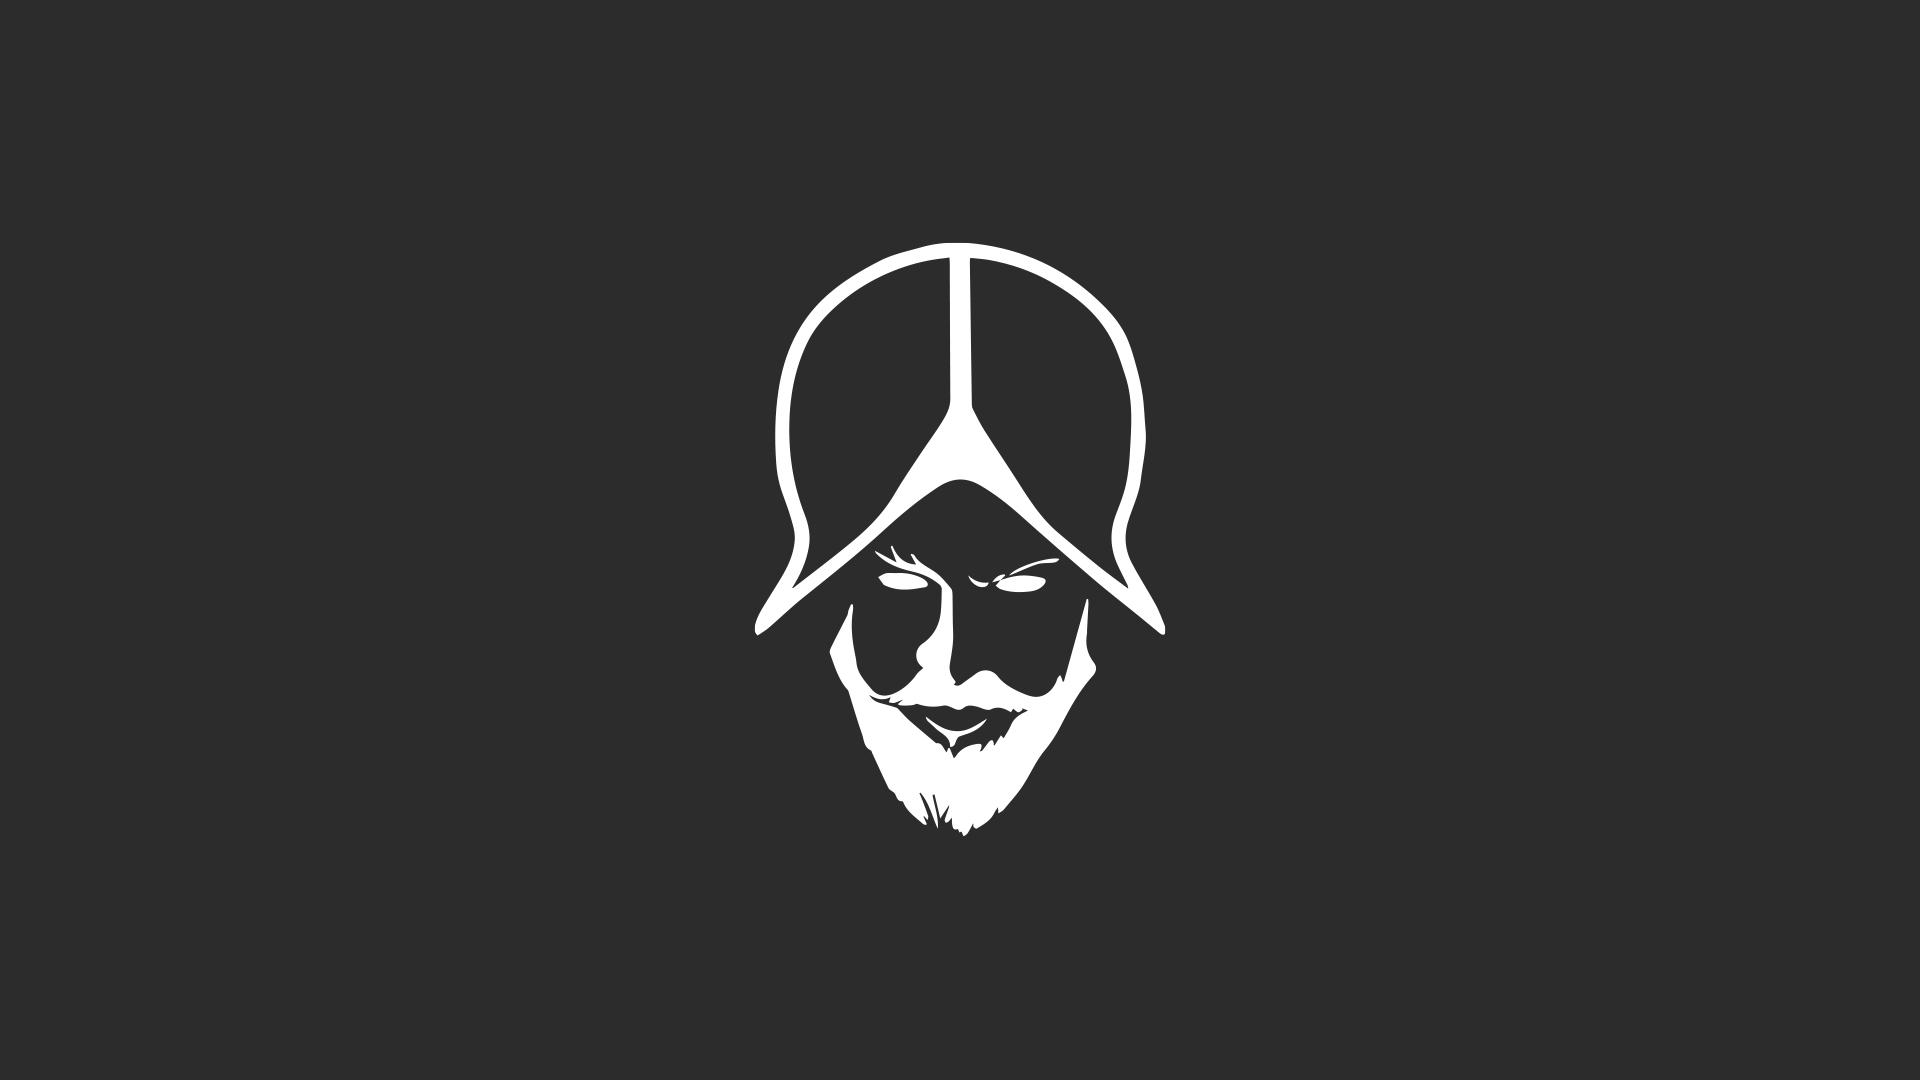 New-world-fans-logo